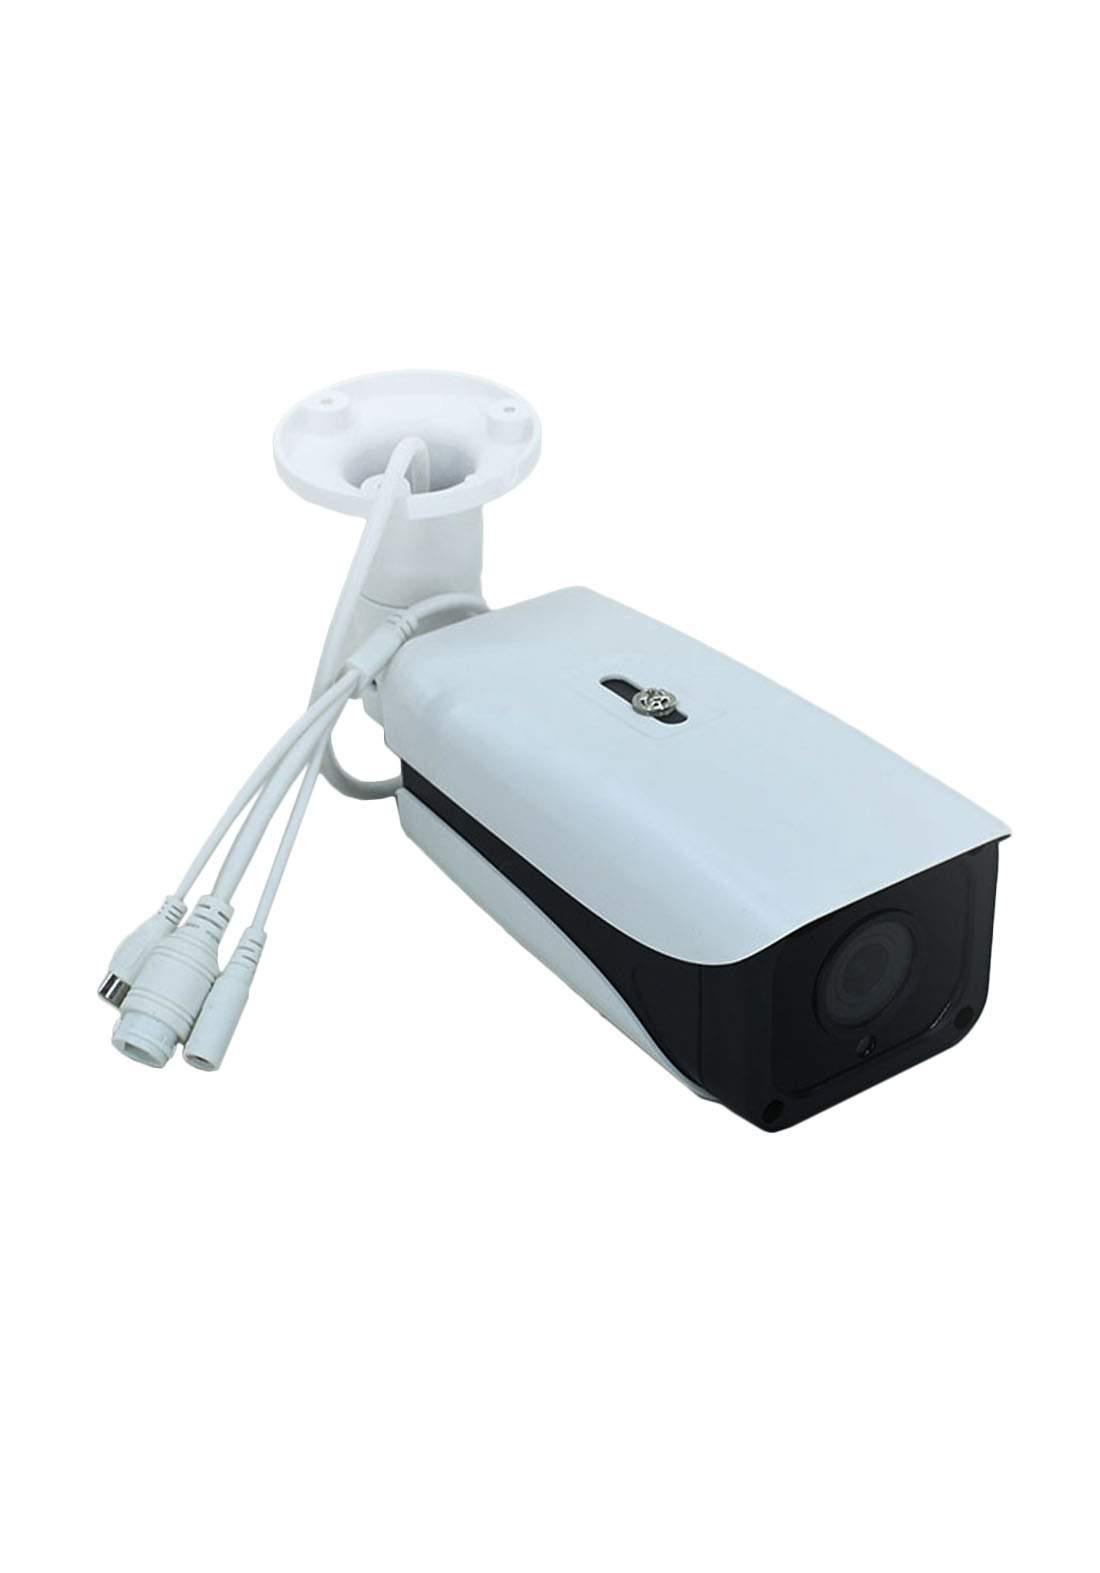 Gstar  Analog High Definition Starlight IP Camera - White كاميرا